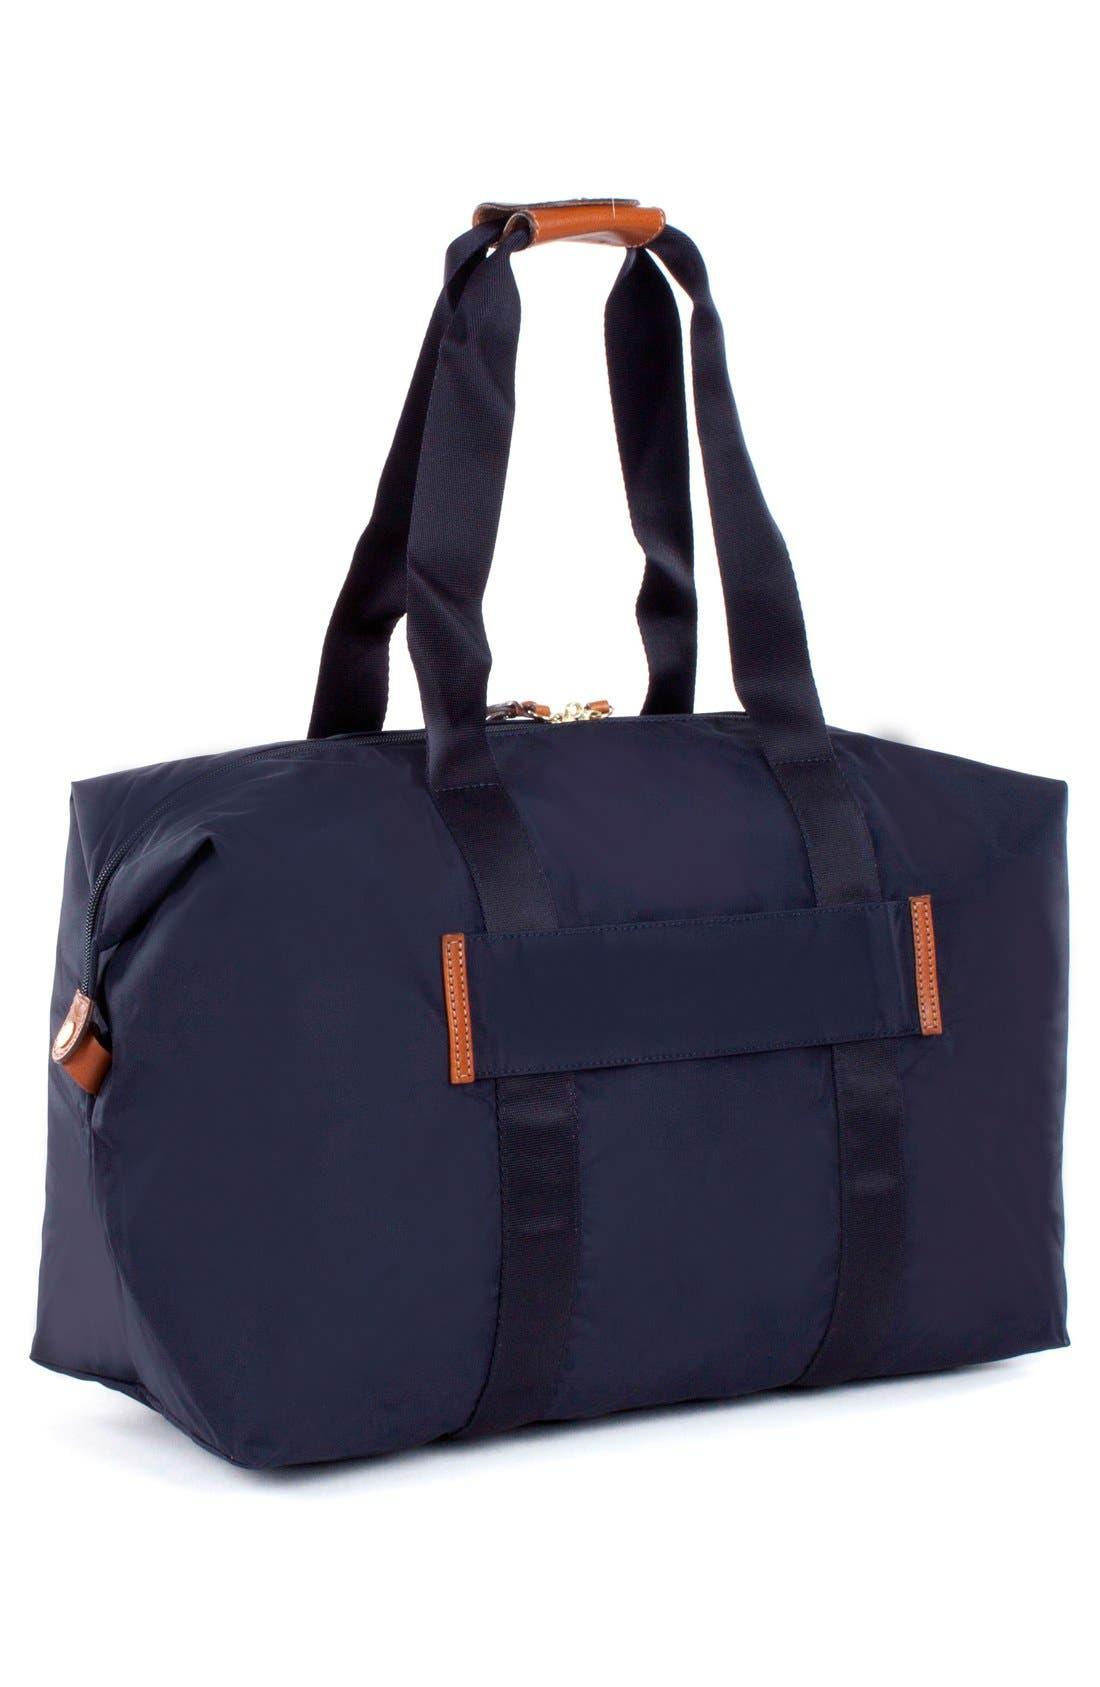 Alternate Image 3  - Bric's 'X-Bag' Folding Duffel Bag (18 Inch)